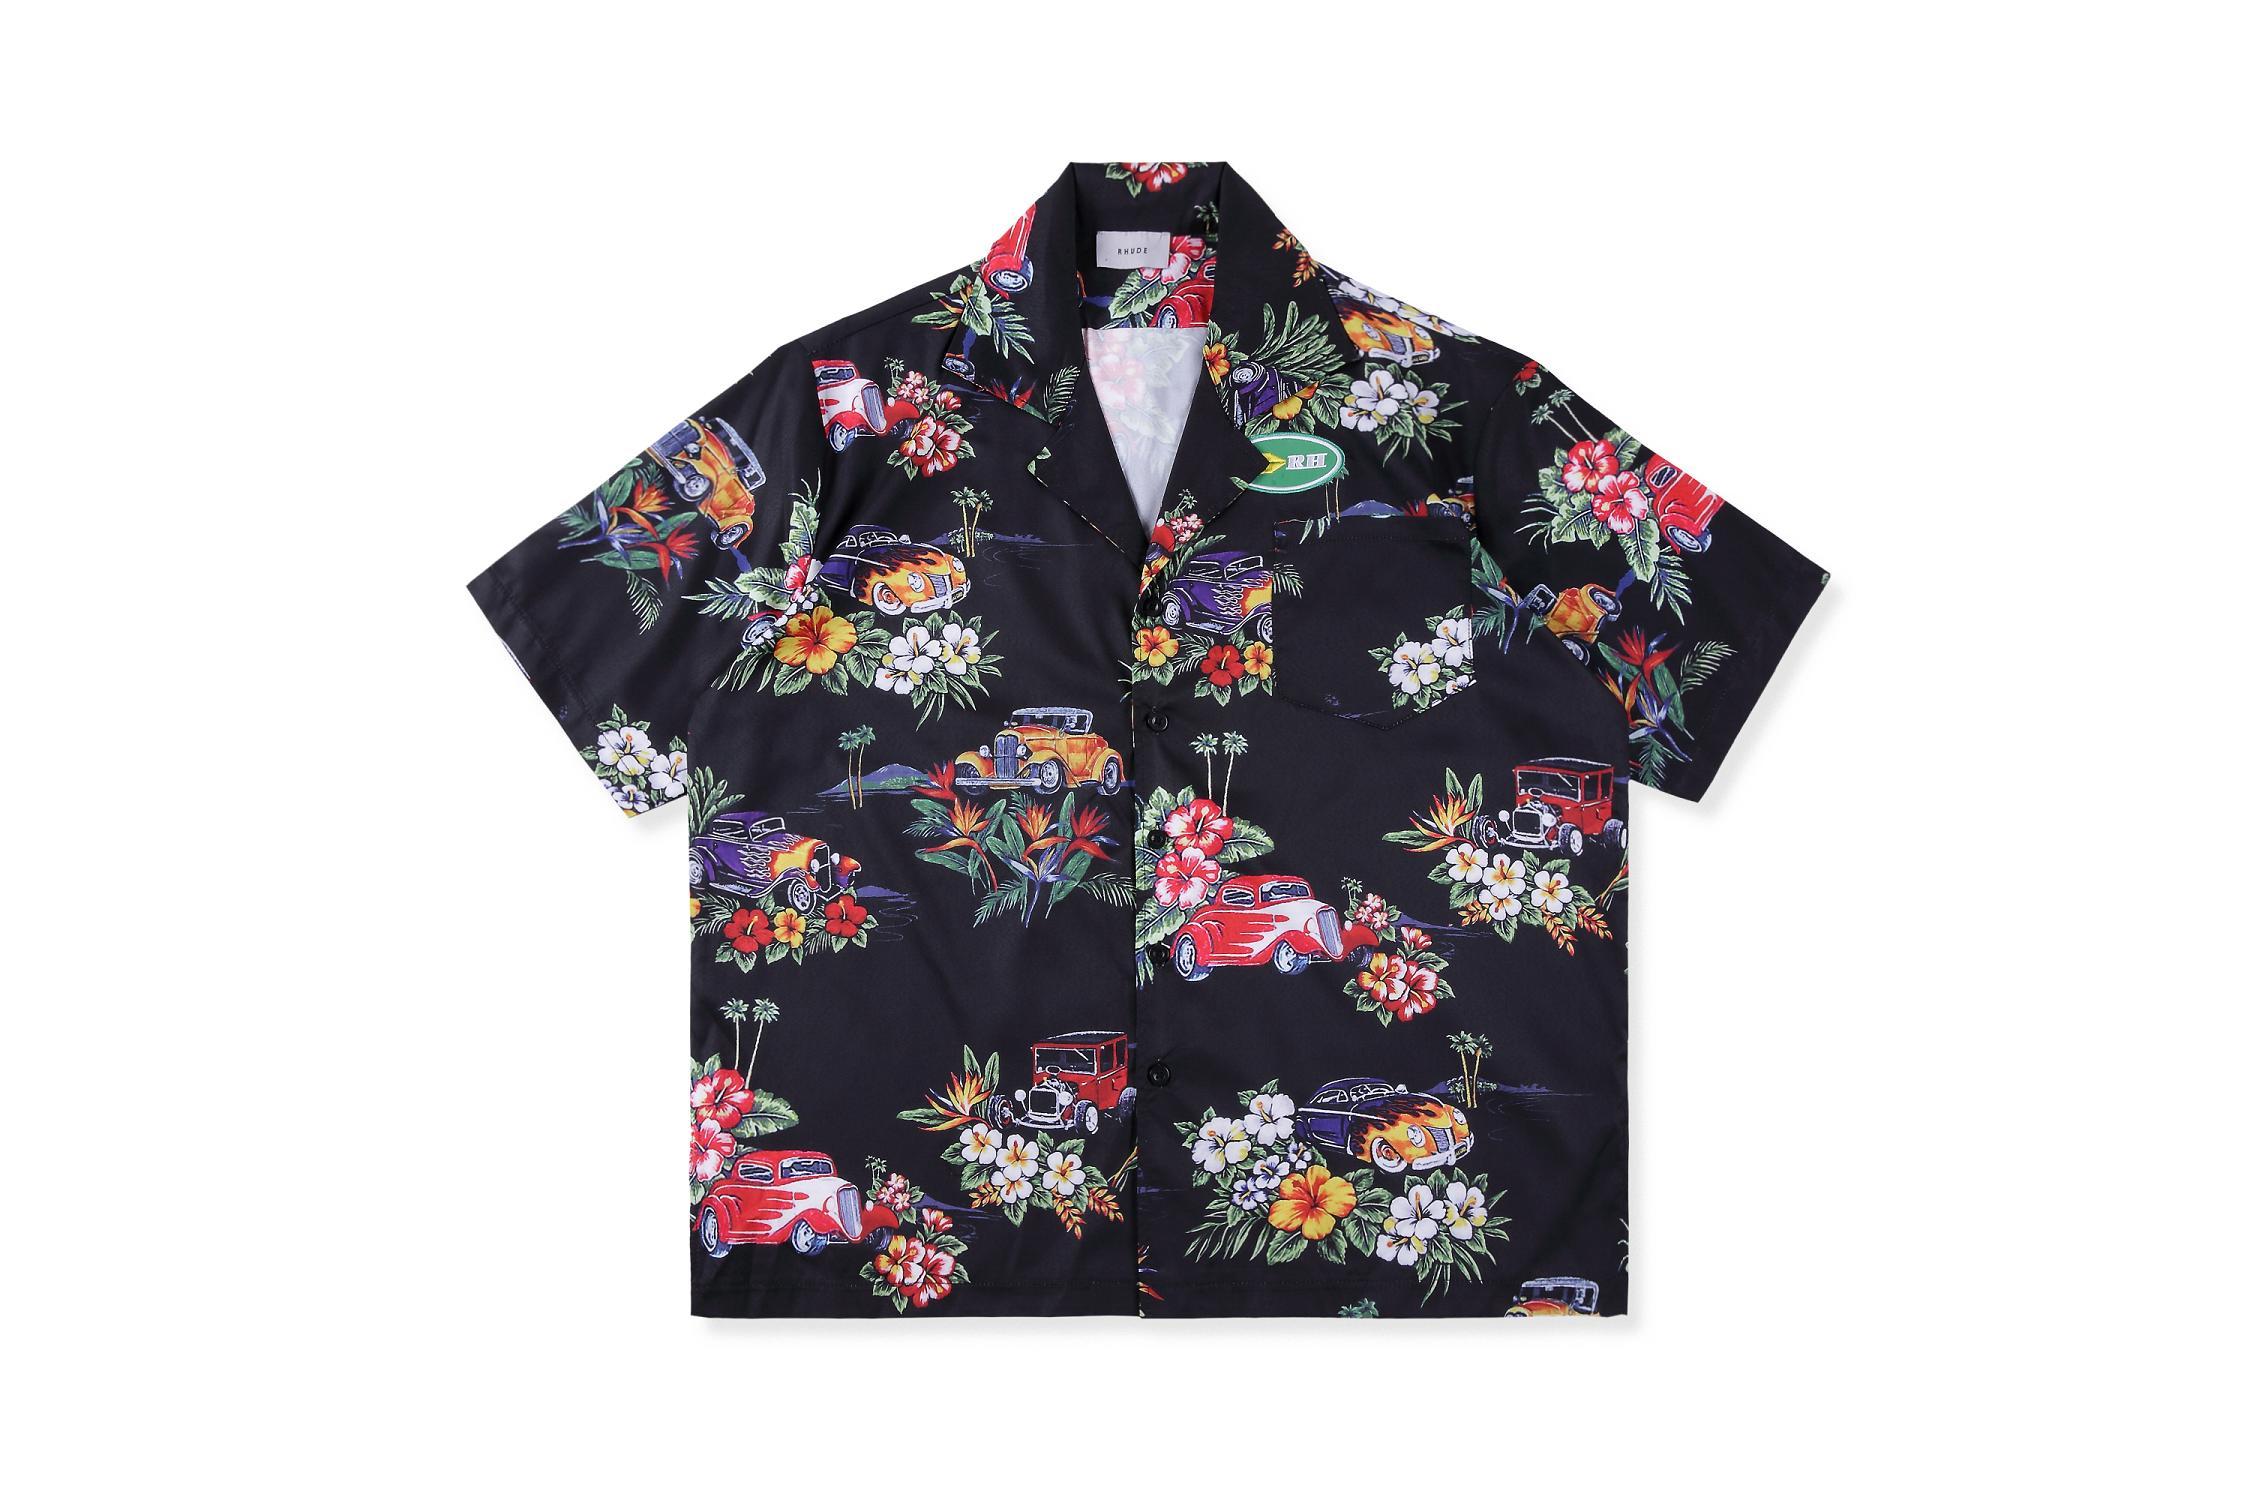 20ss RHUDE camiseta hawaiana hombres mujeres 11 top versión Camiseta corta RHUDE top tees Streetwear Hip Hop Casual RHUDE camiseta